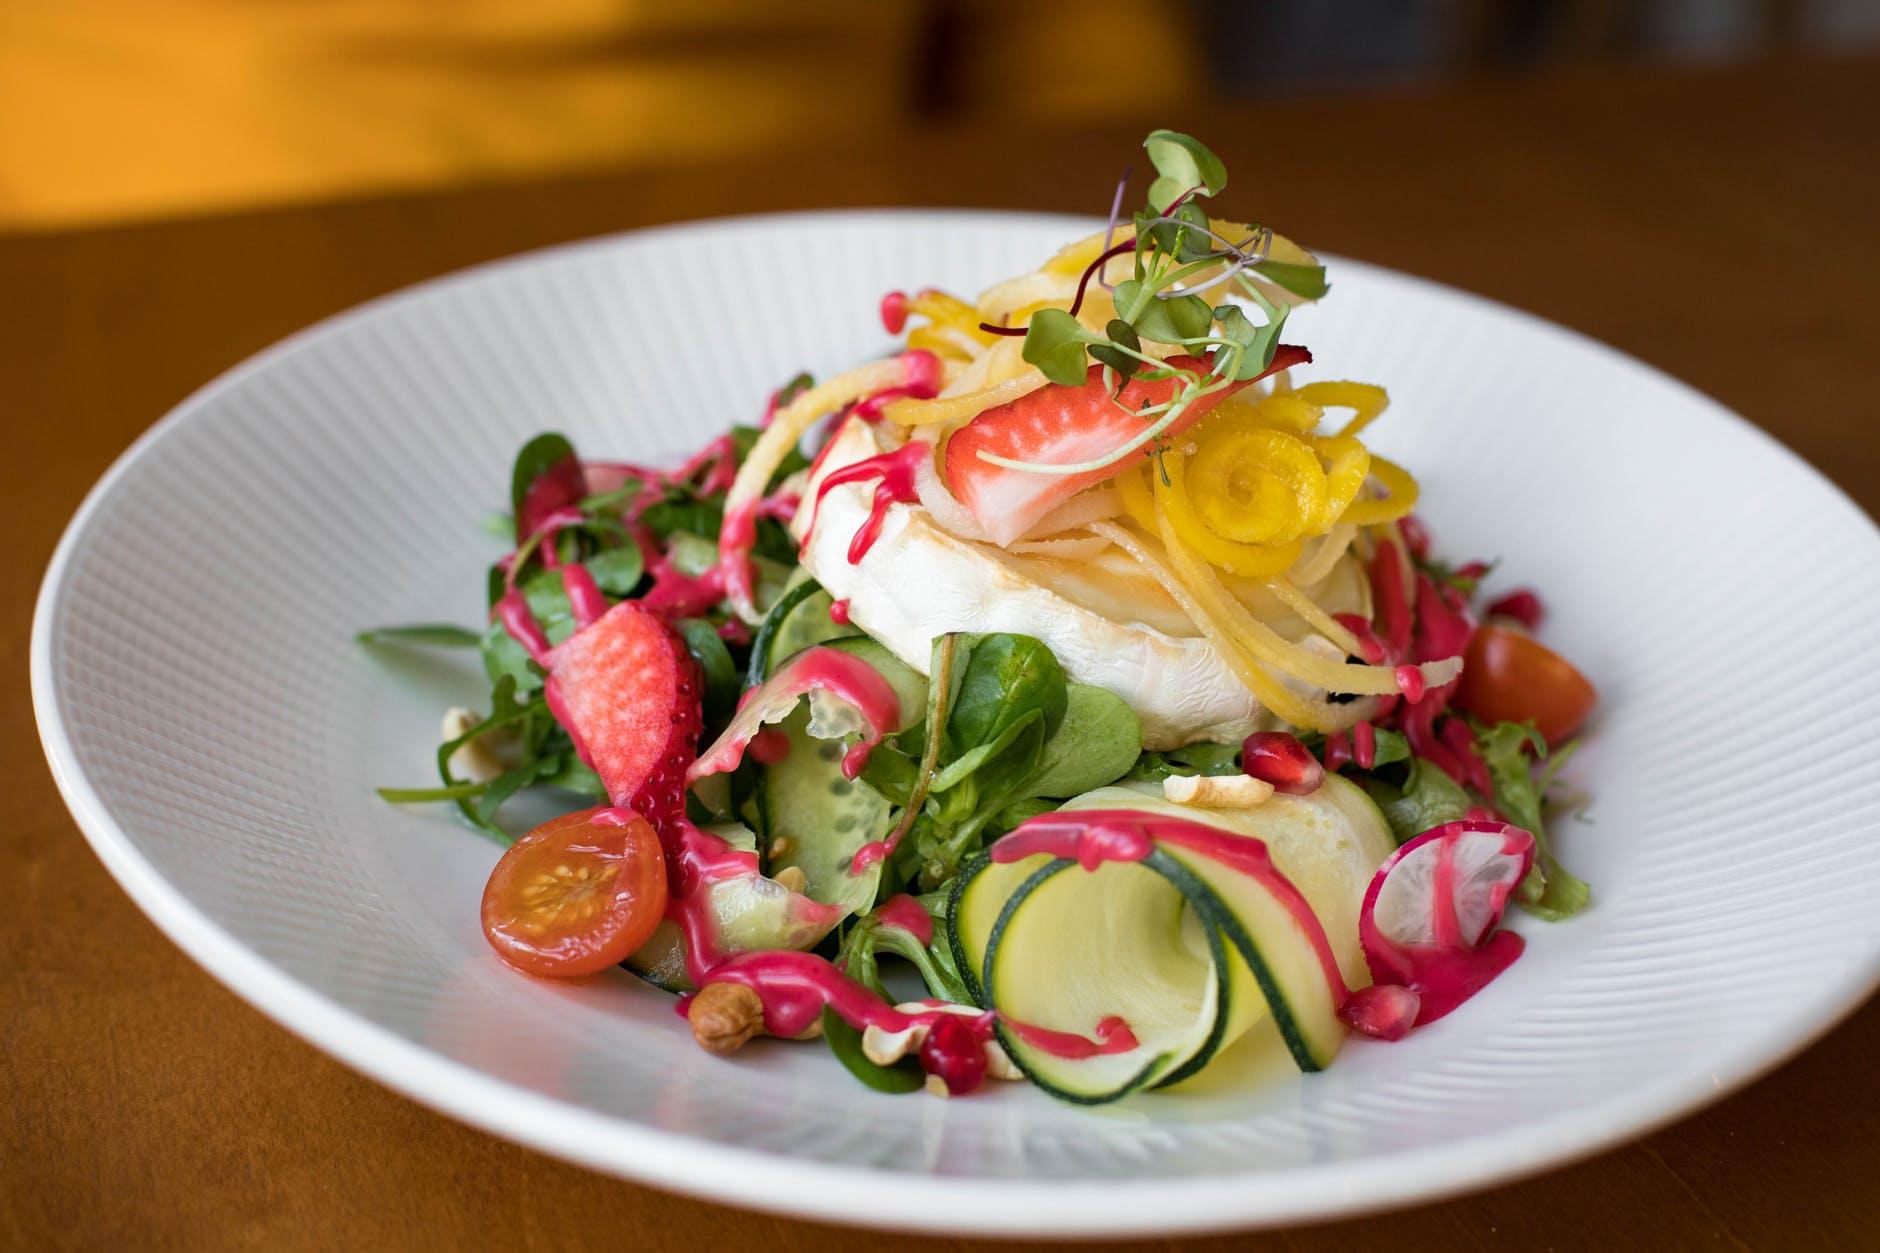 photo of salad on plate